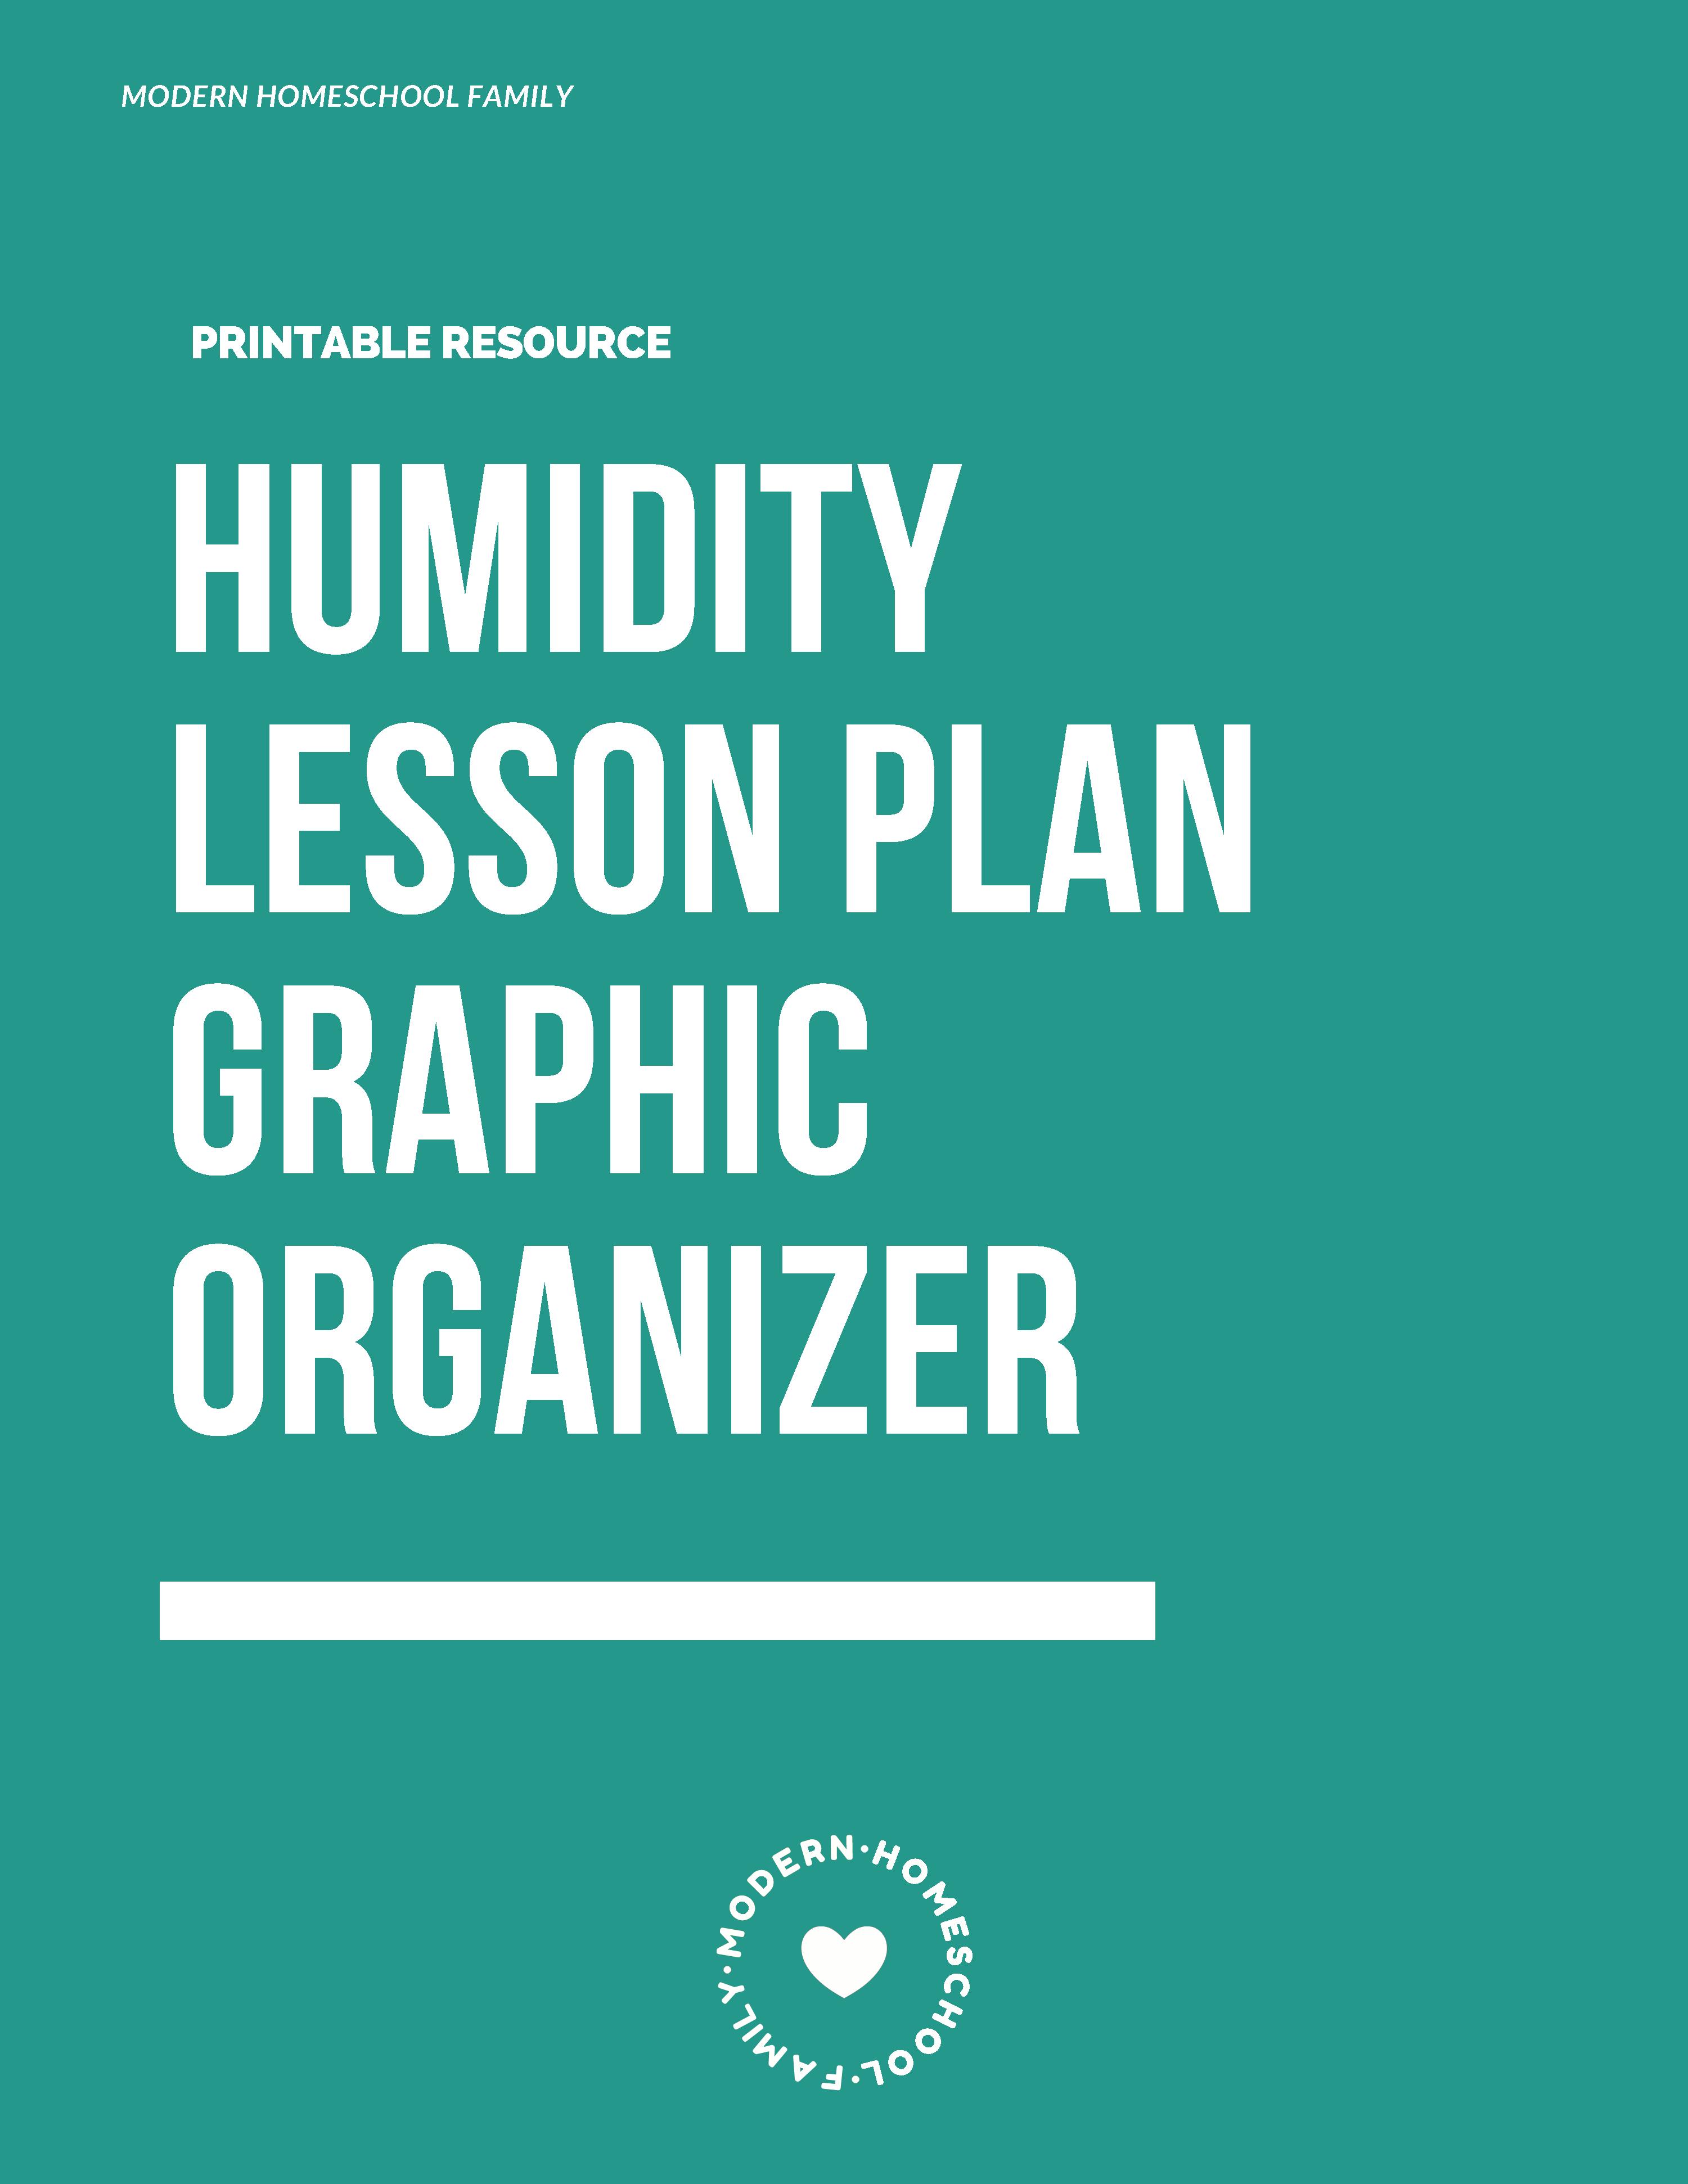 Humidity Lesson Plan Printable Worksheet  Modern Homeschool Family Also Free Homeschool Printable Worksheets